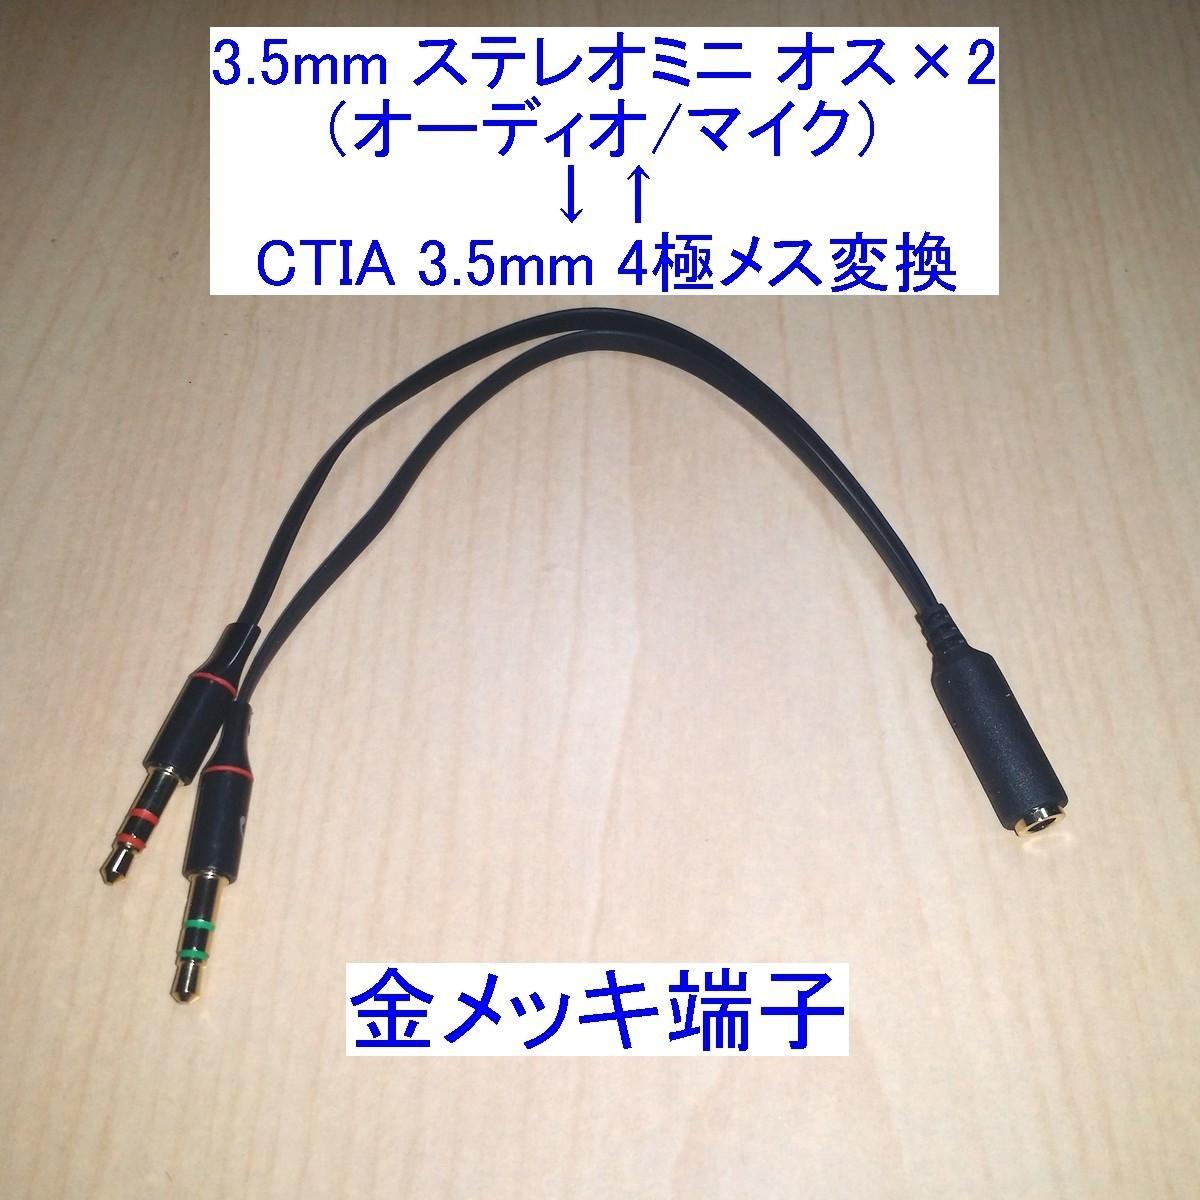 3.5mmステレオミニプラグ3極オス(オーディオ/マイク)×2⇔CTIA 4極メス変換ケーブル 新品 4極対応ヘッドセットに